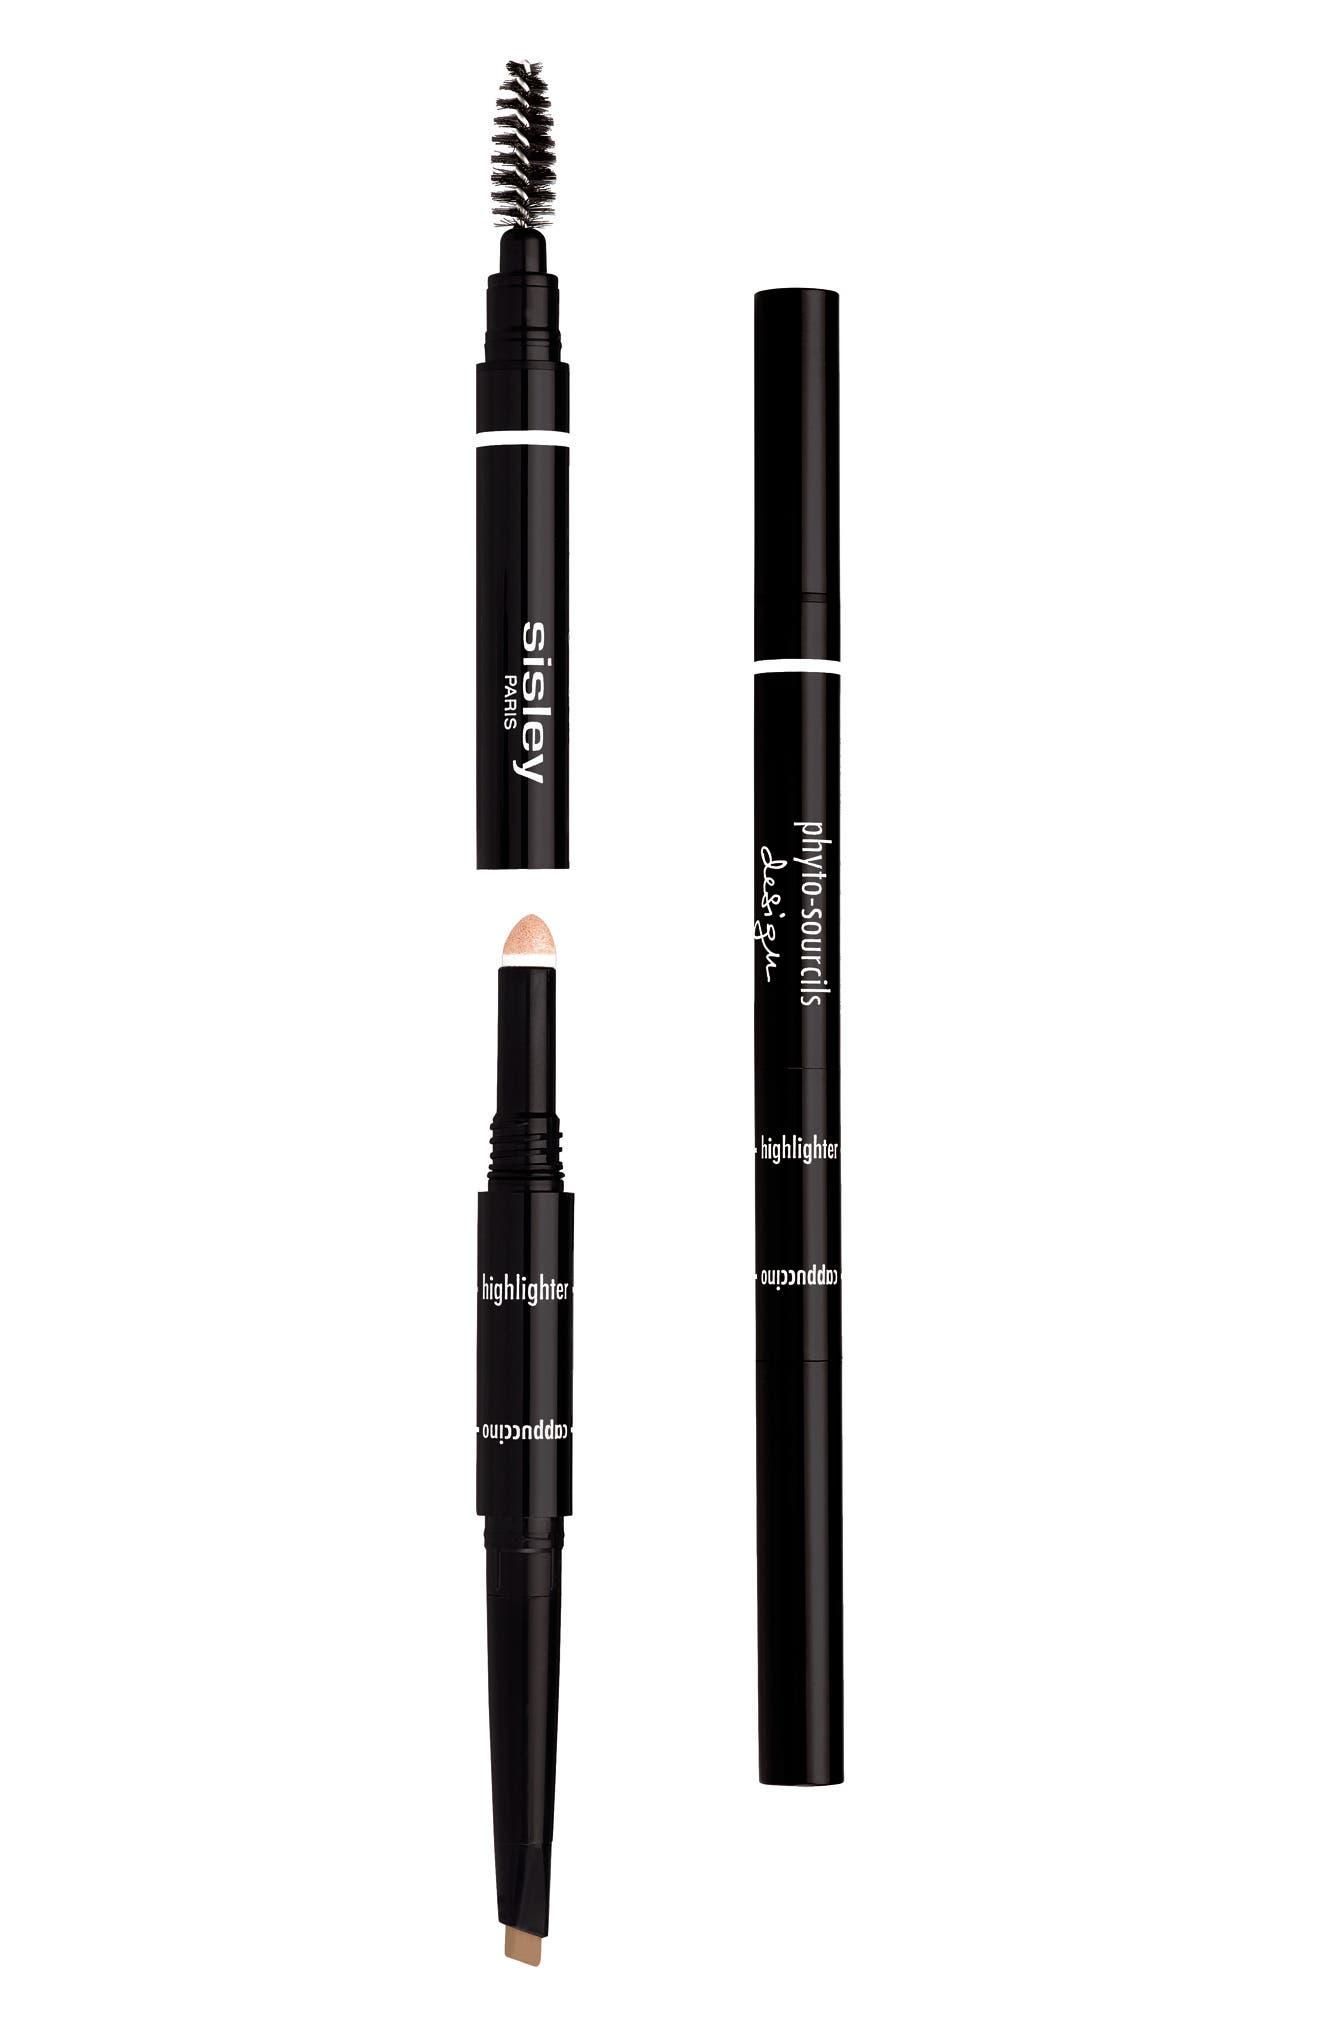 SISLEY PARIS, Phyto-Sourcils Design 3-in-1 Eyebrow Pencil, Main thumbnail 1, color, CAPPUCINO